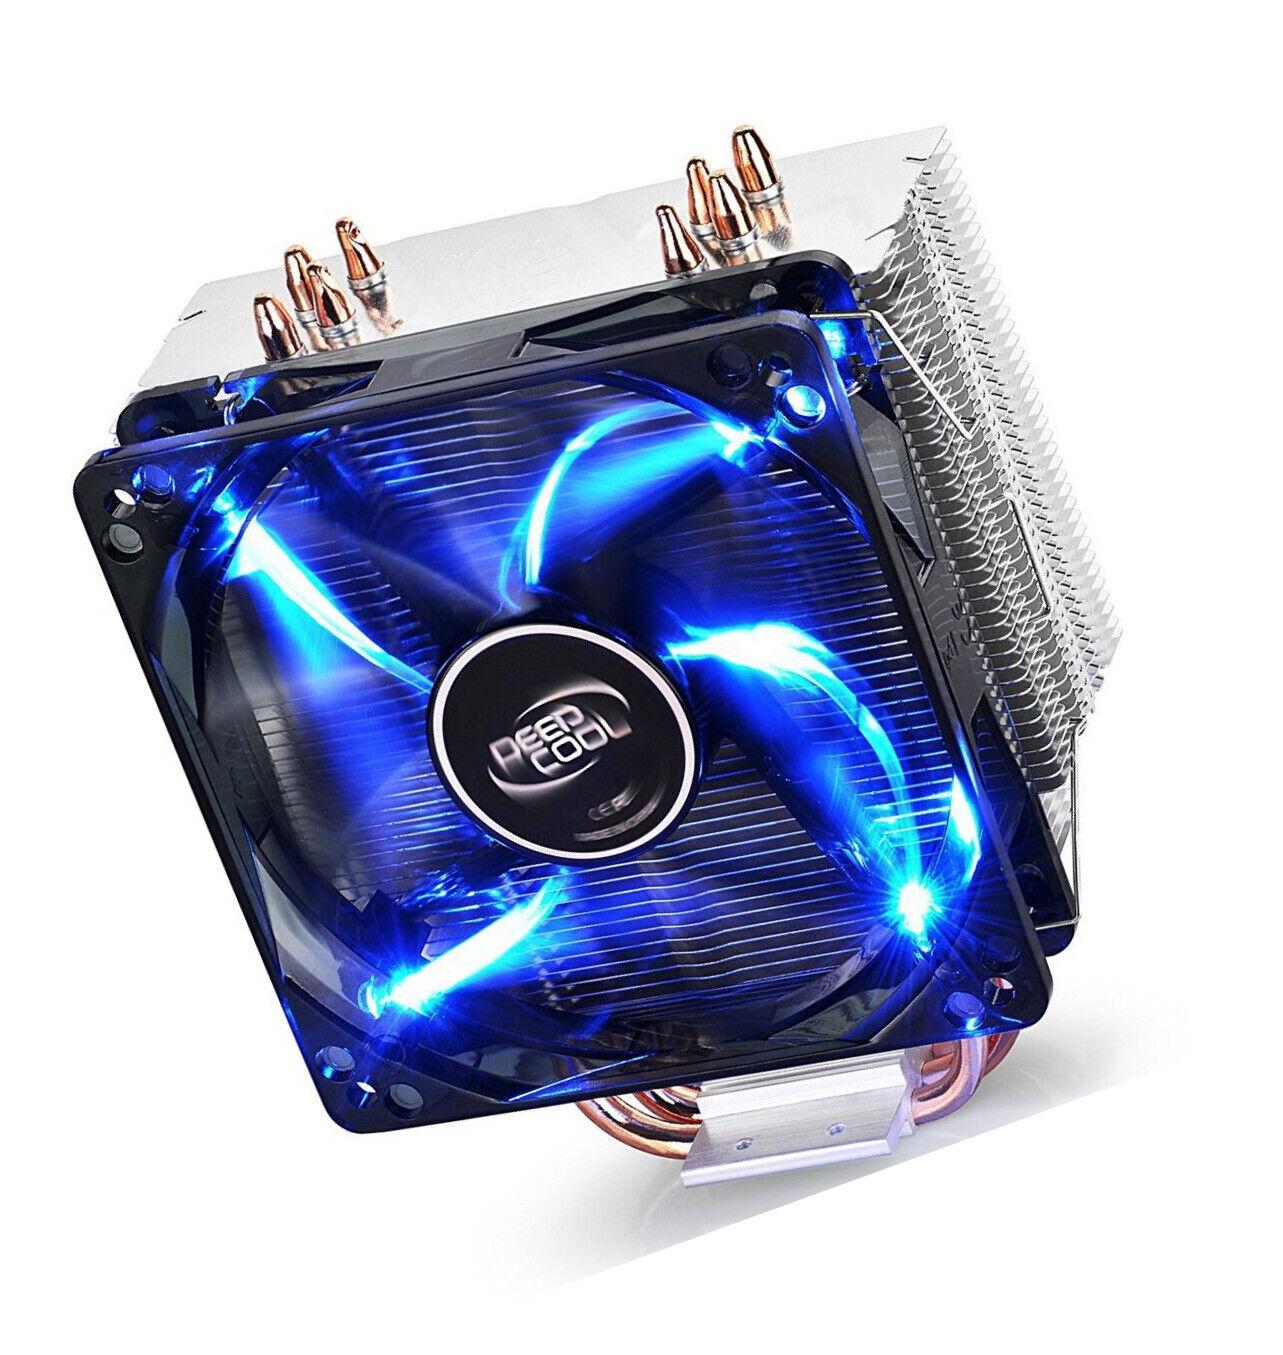 gammaxx 400 cpu air cooler with 4